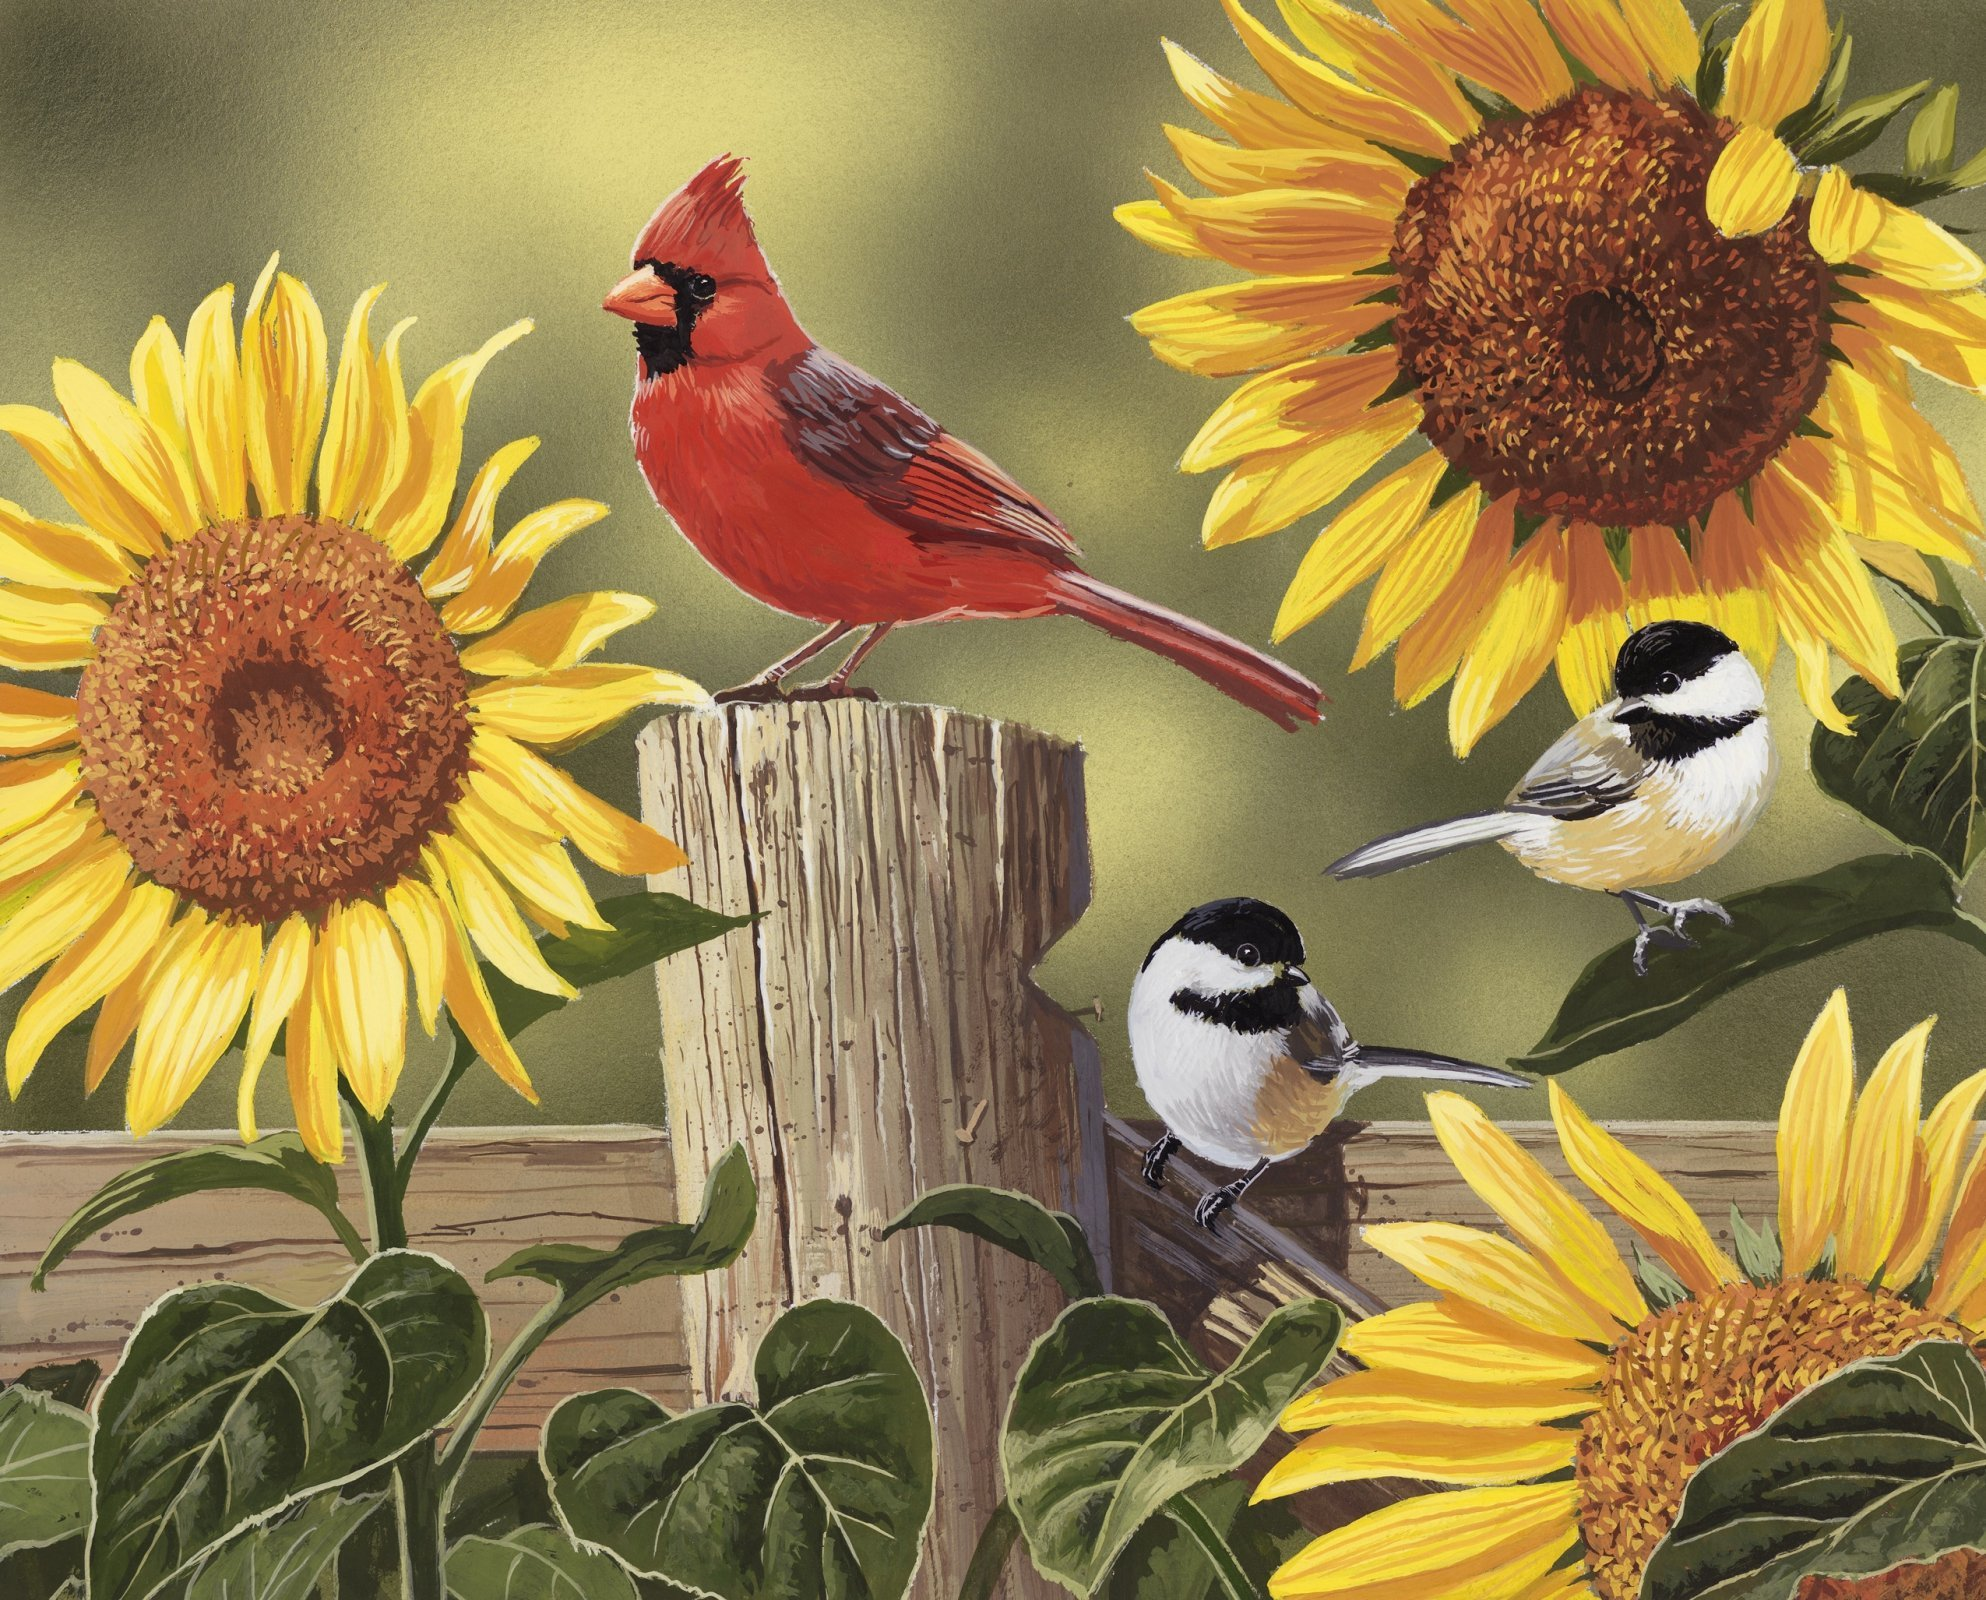 Sunflowers & Birds 4167 Panel 36